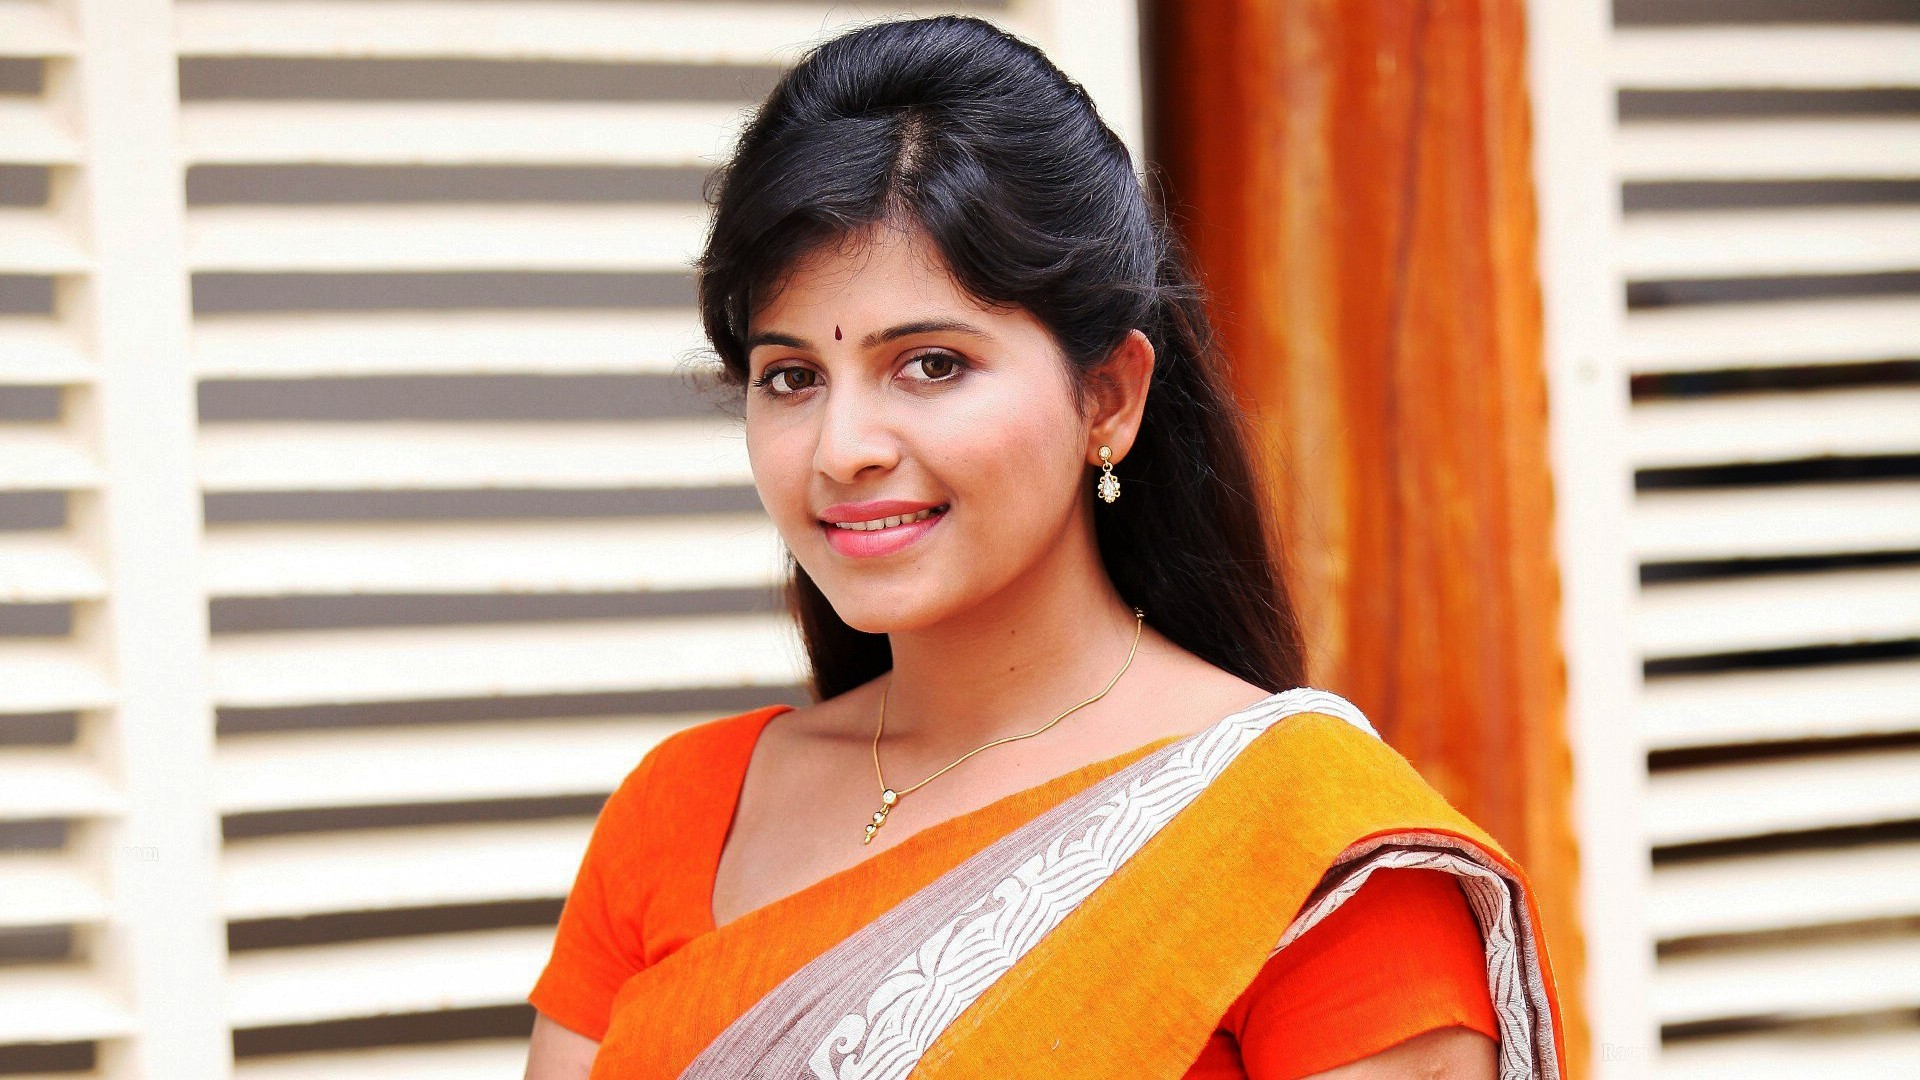 anjali tamil actress wallpaper background